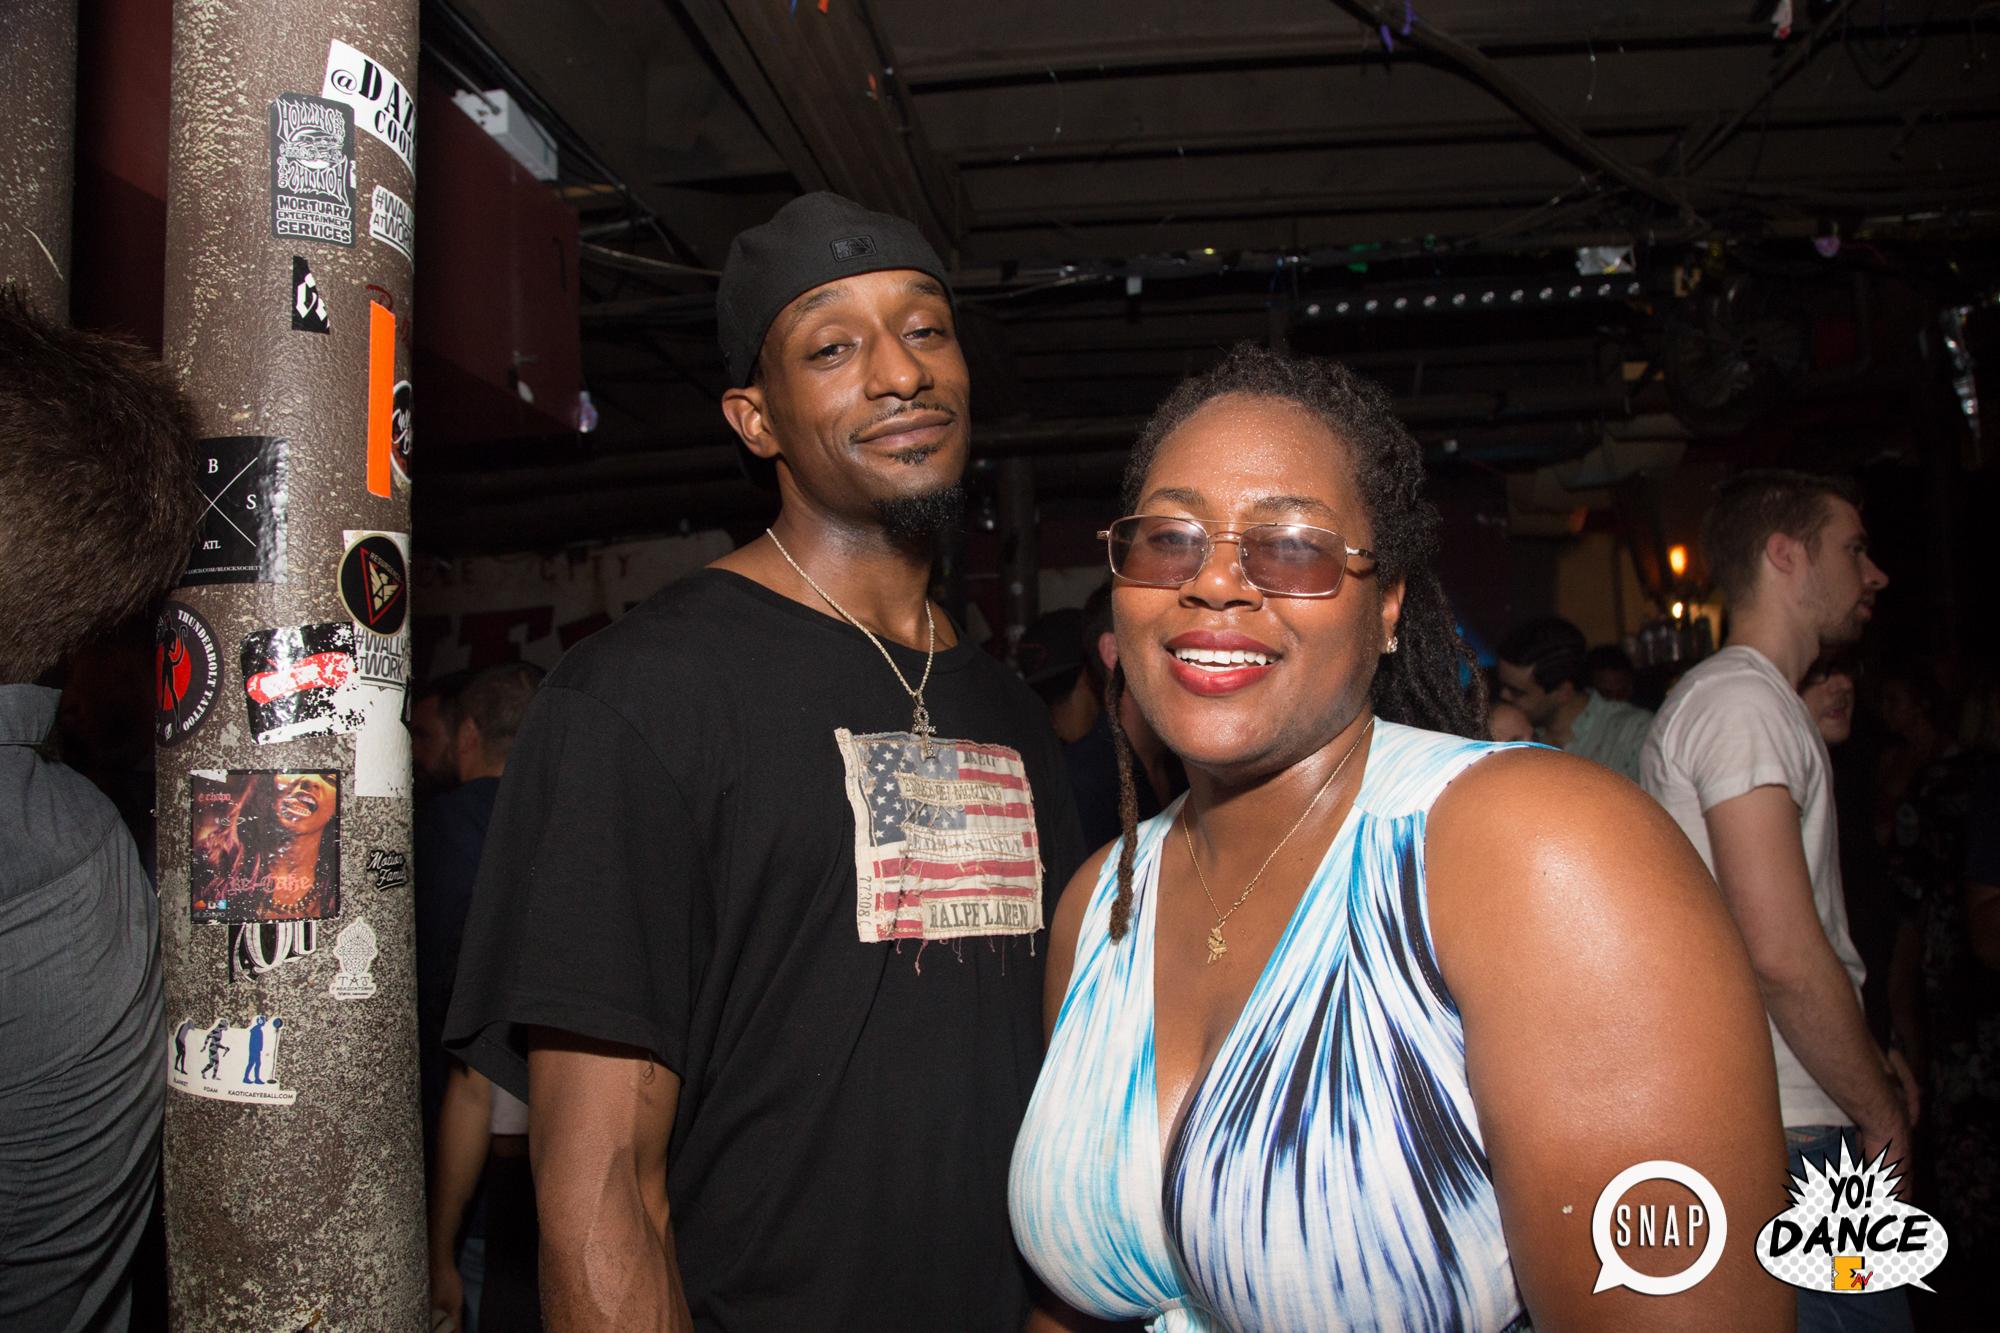 22Yo Dance Oh Snap Kid Atlanta.jpg